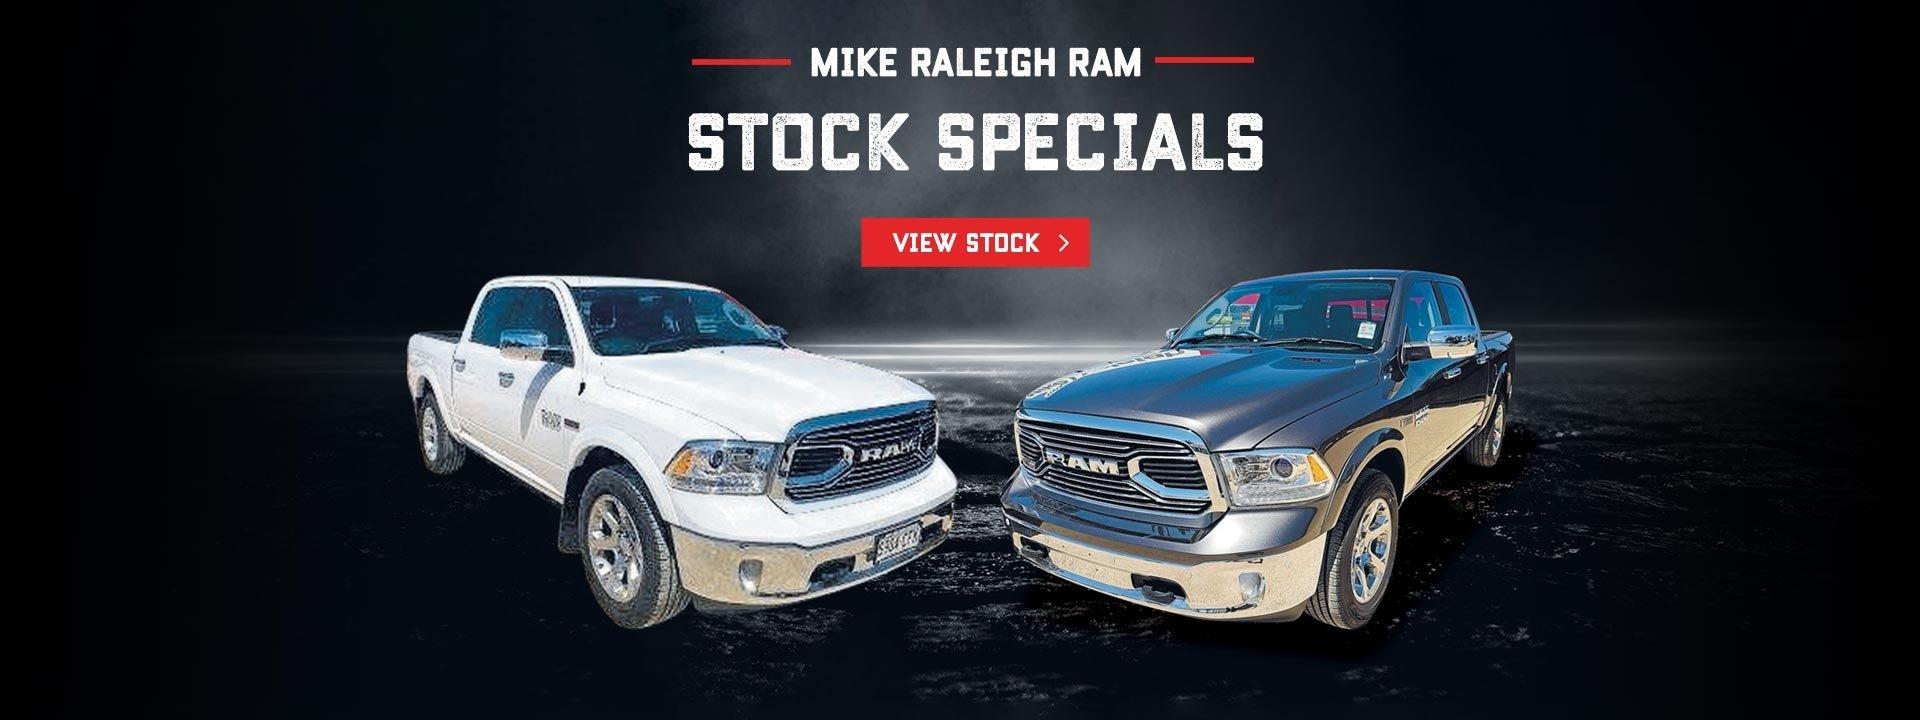 Mike Raleigh Motors Ram Stock Specials